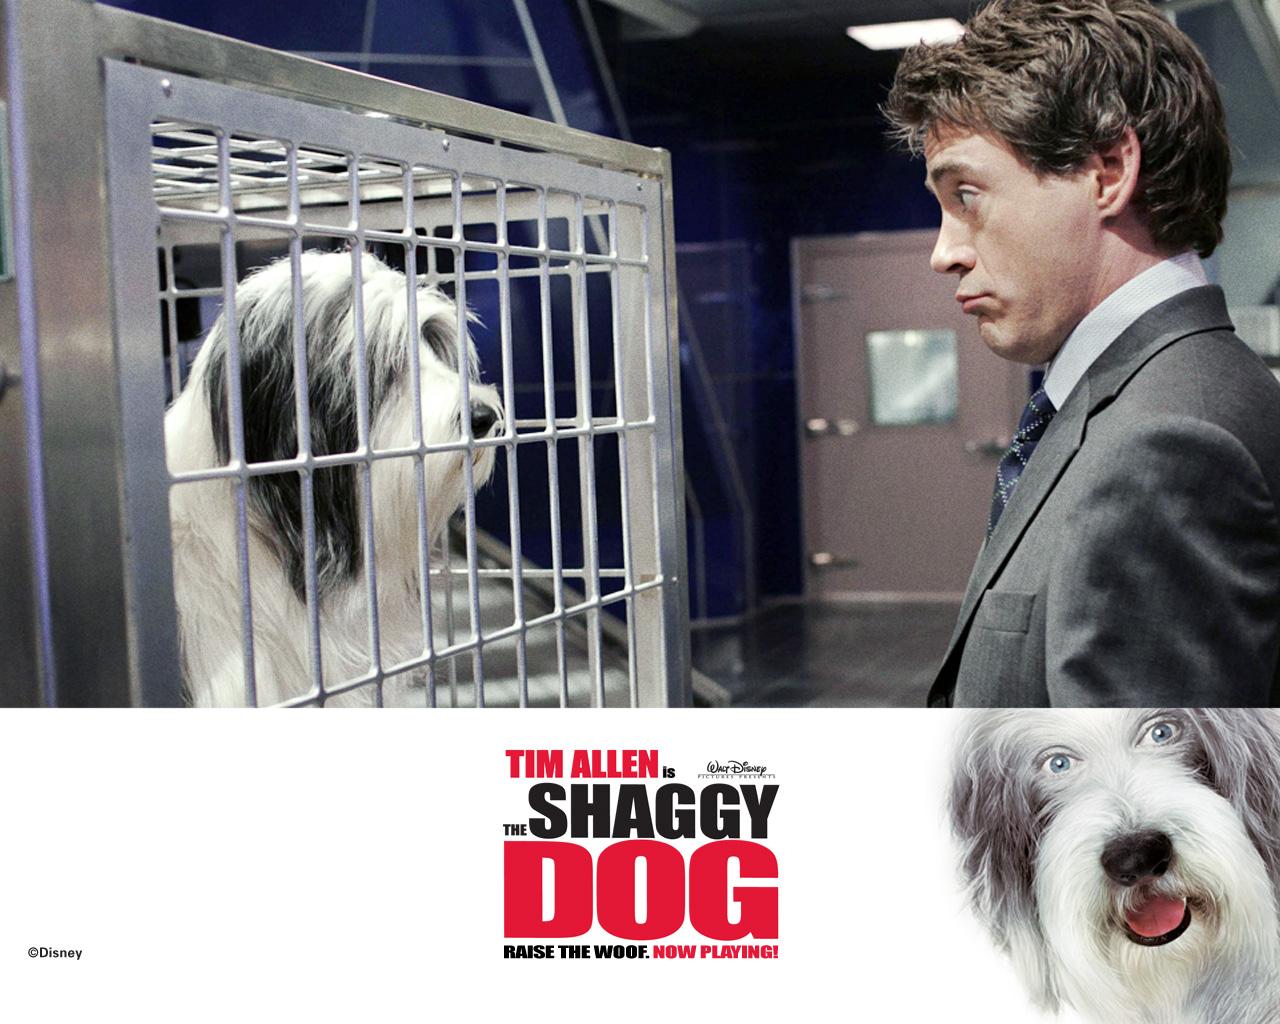 「the shaggy dog 2006」の画像検索結果